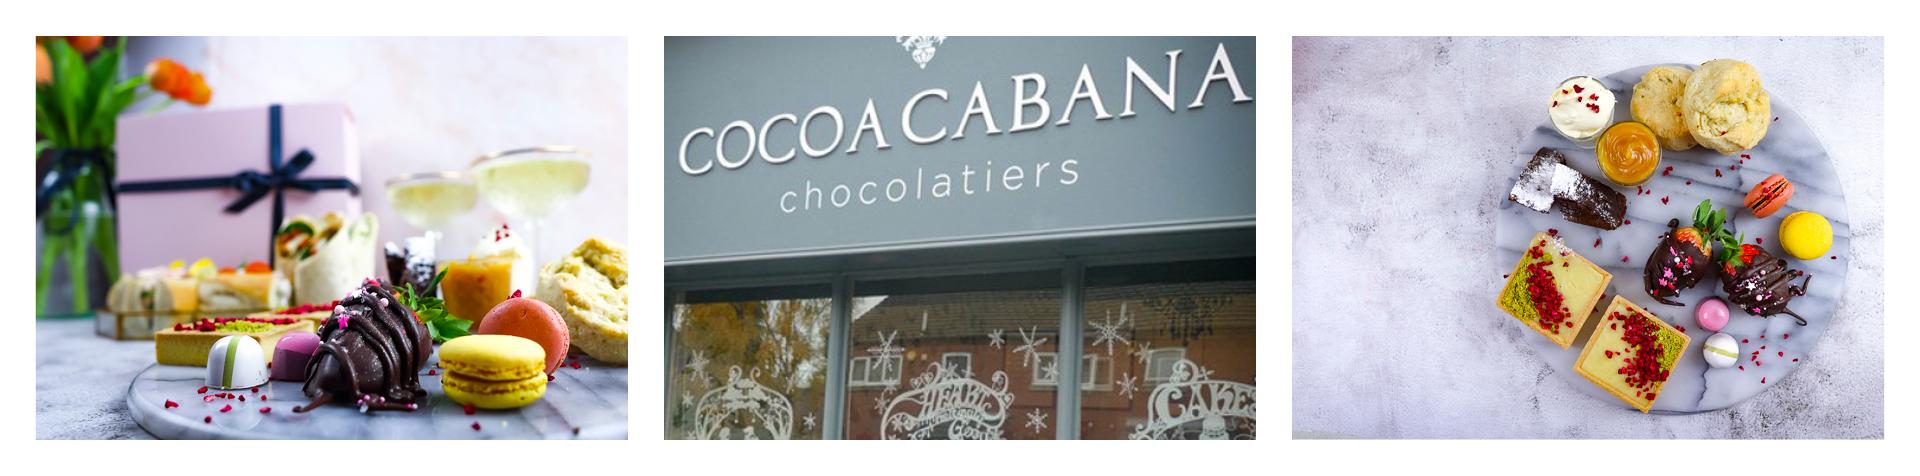 Cocoa Cabana Example Foods